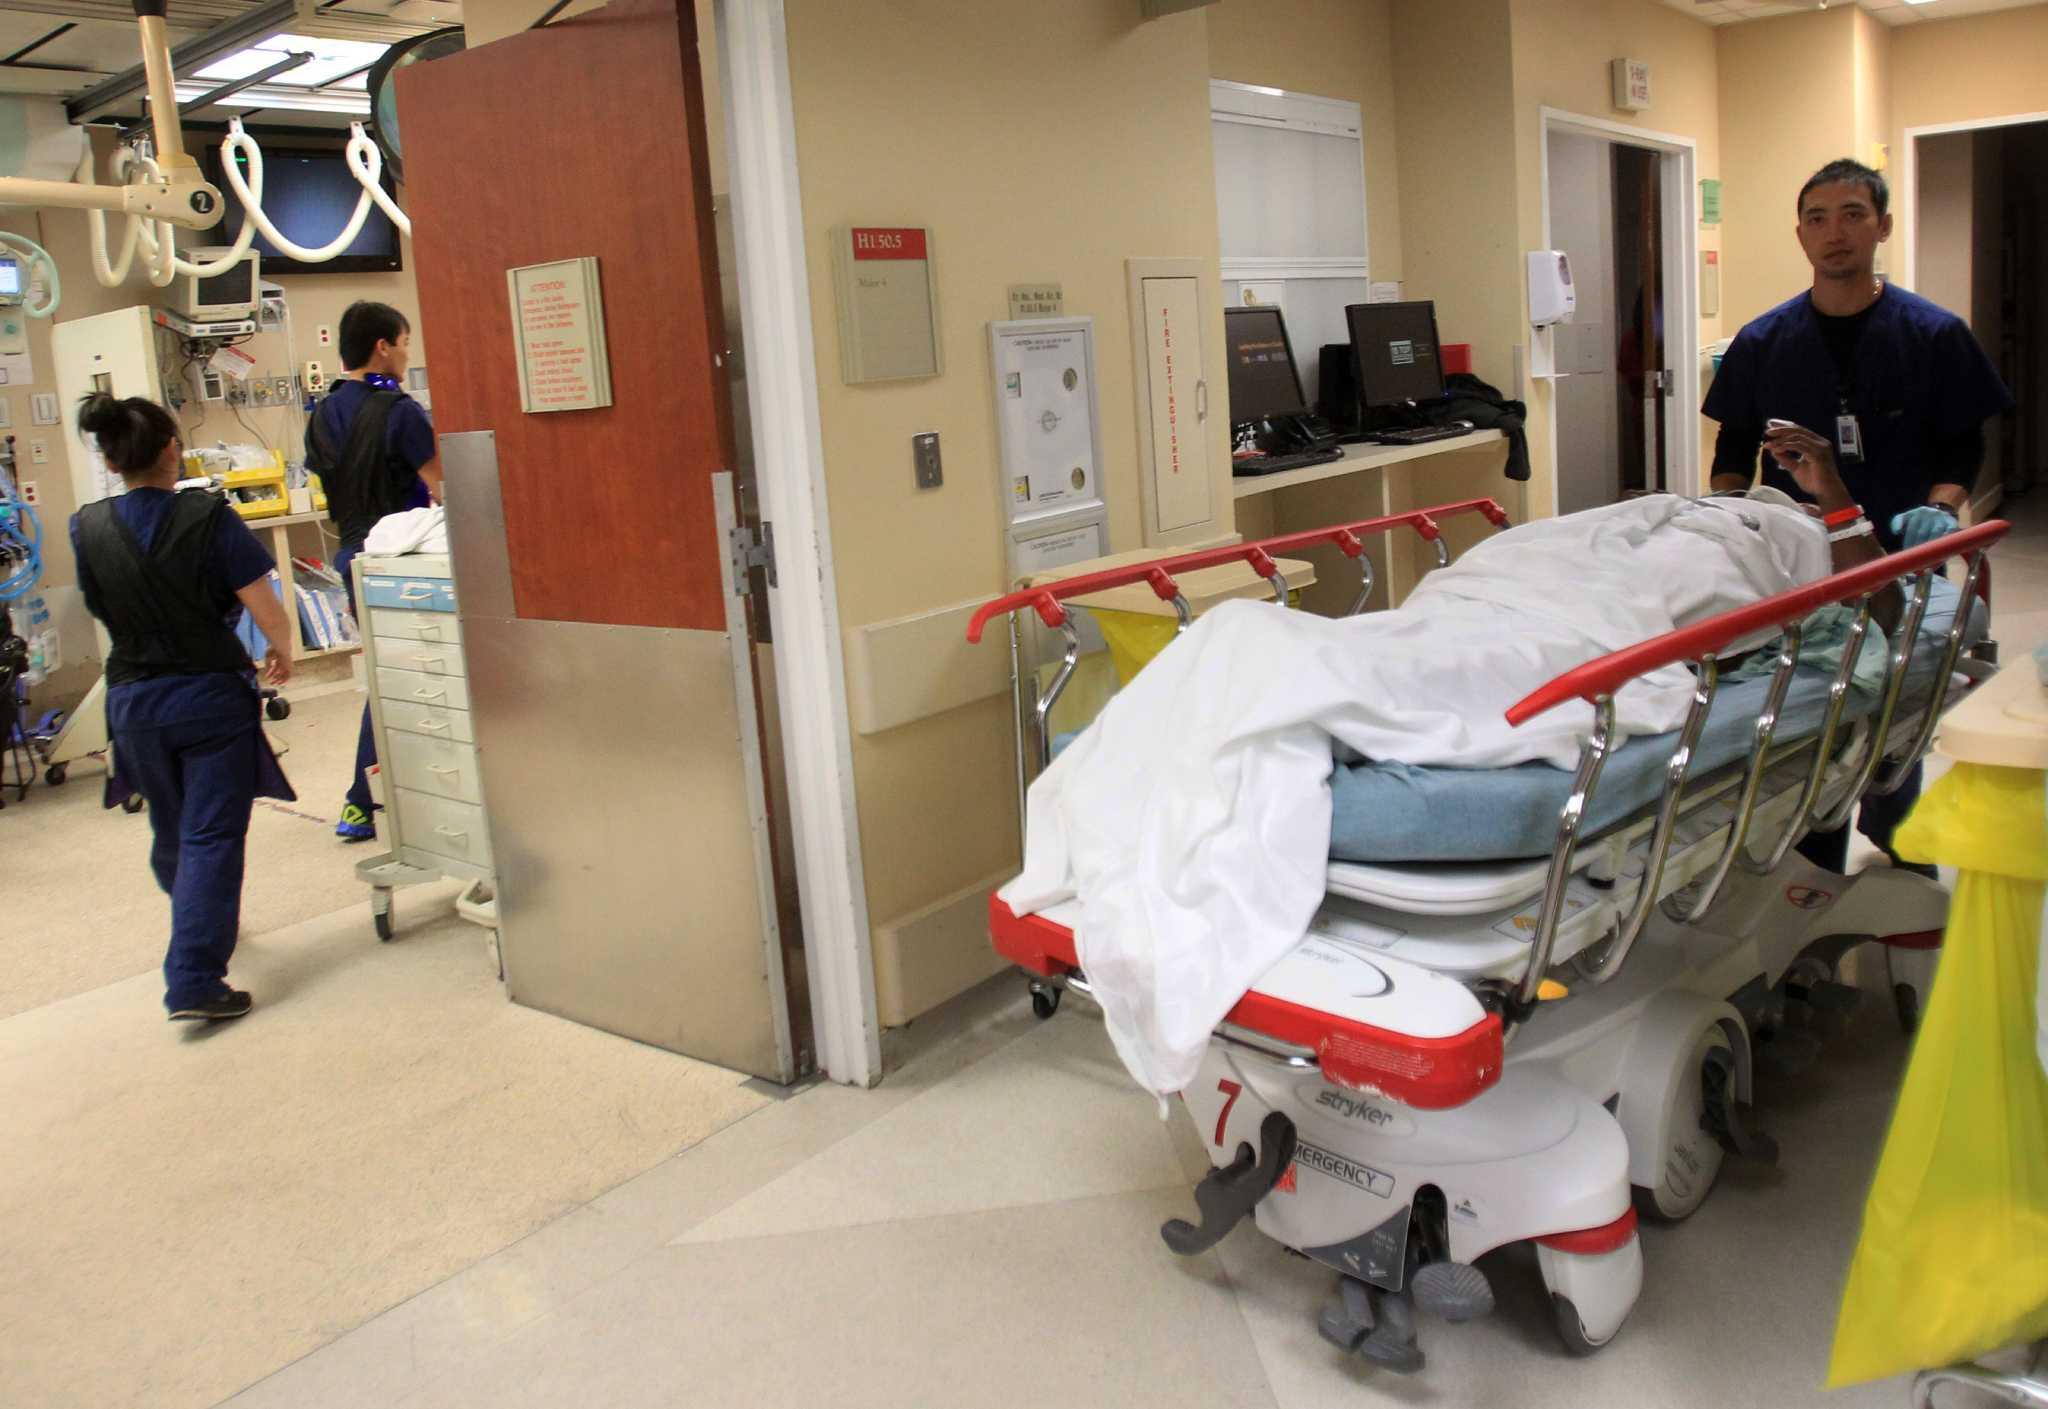 Emergency room observation essays